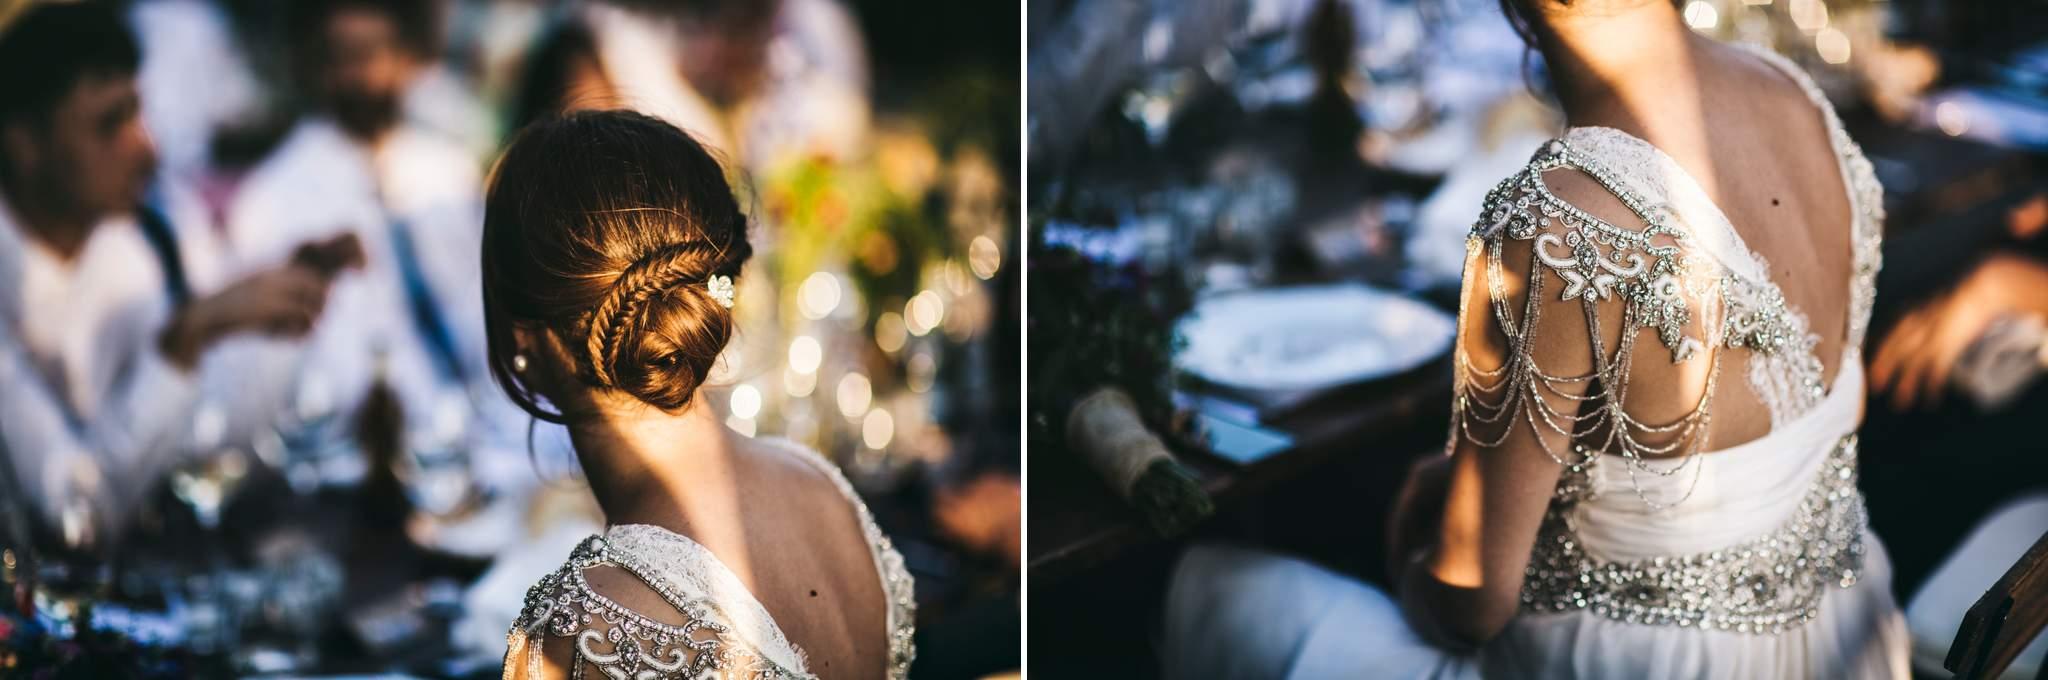 36wedding-photographer-villa-petrolo